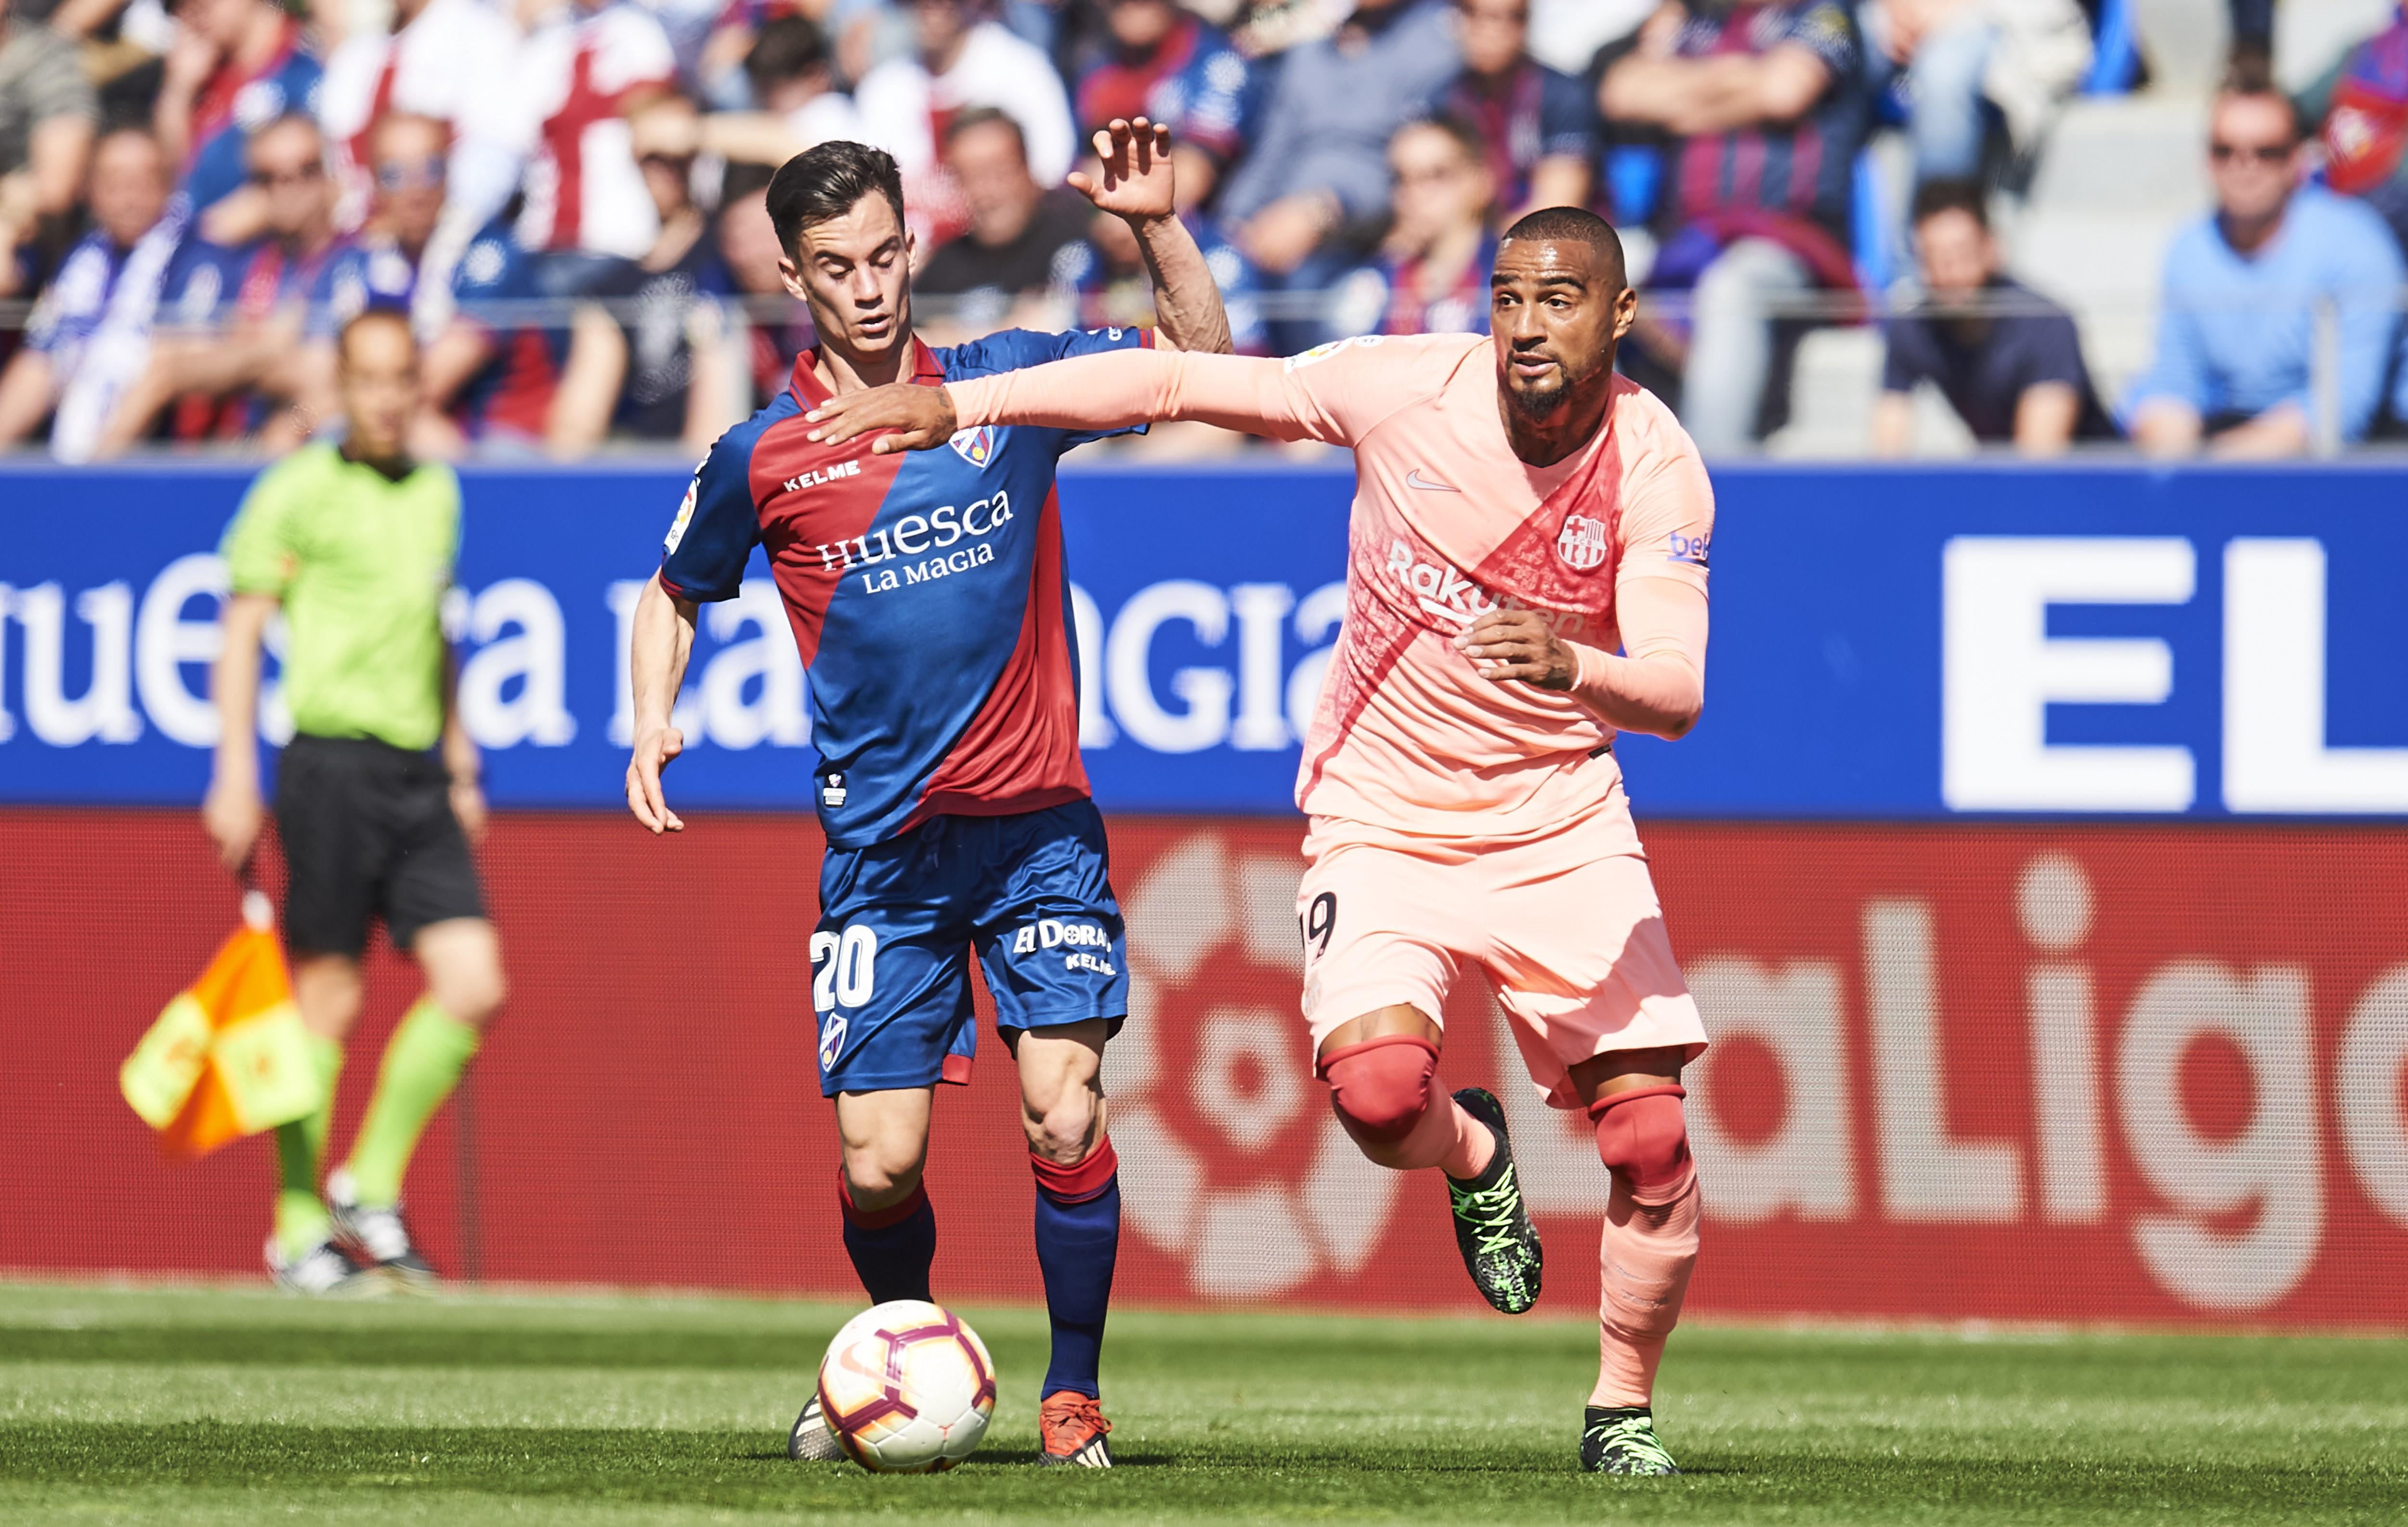 Kevin-Prince Boateng lors de la rencontre Huesca-FC Barcelone / Liga